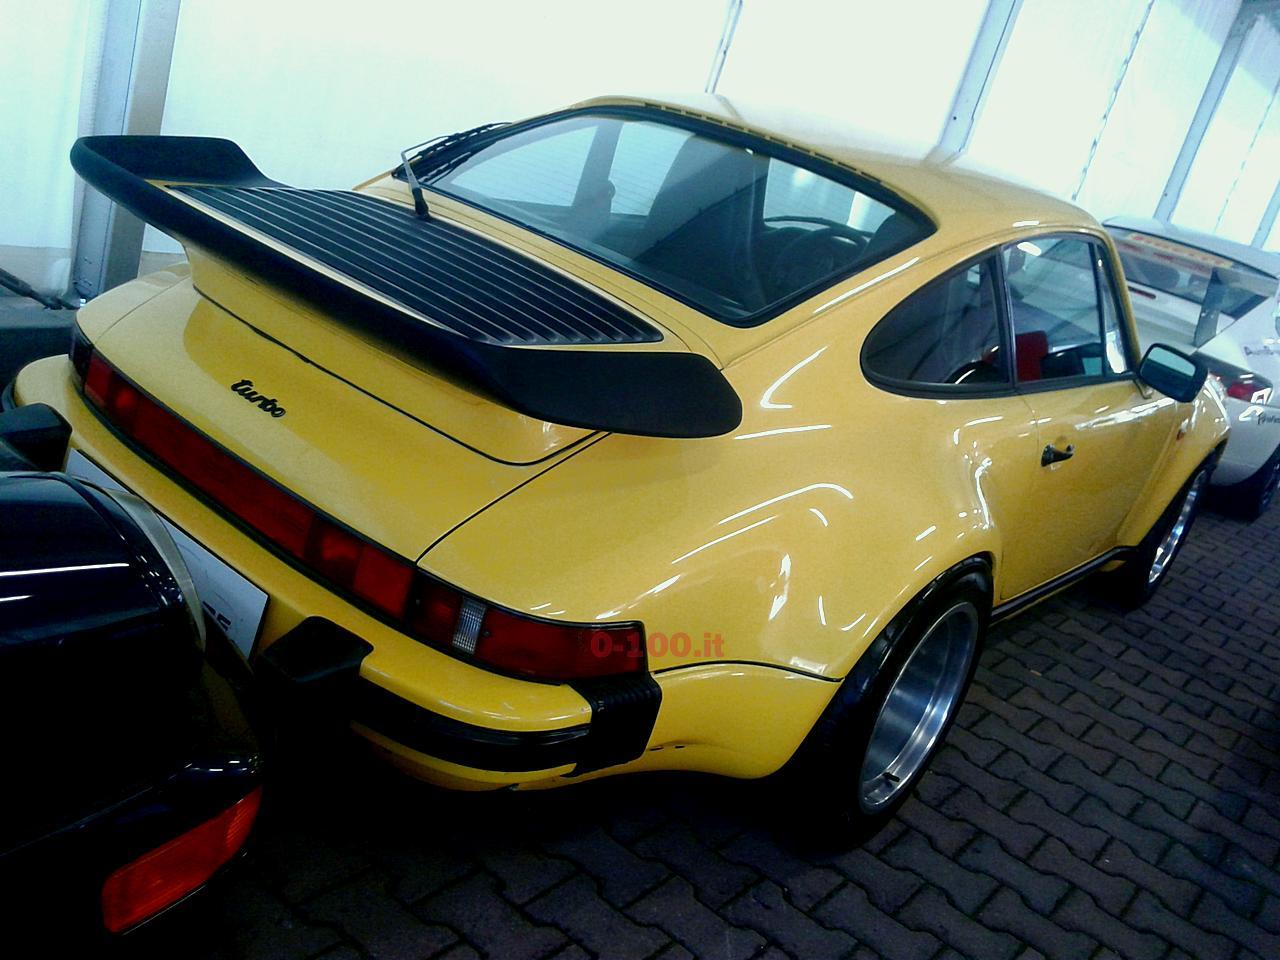 automotodepoca-2015-porsche-911-964-993-carrera-turbo_0-100_049